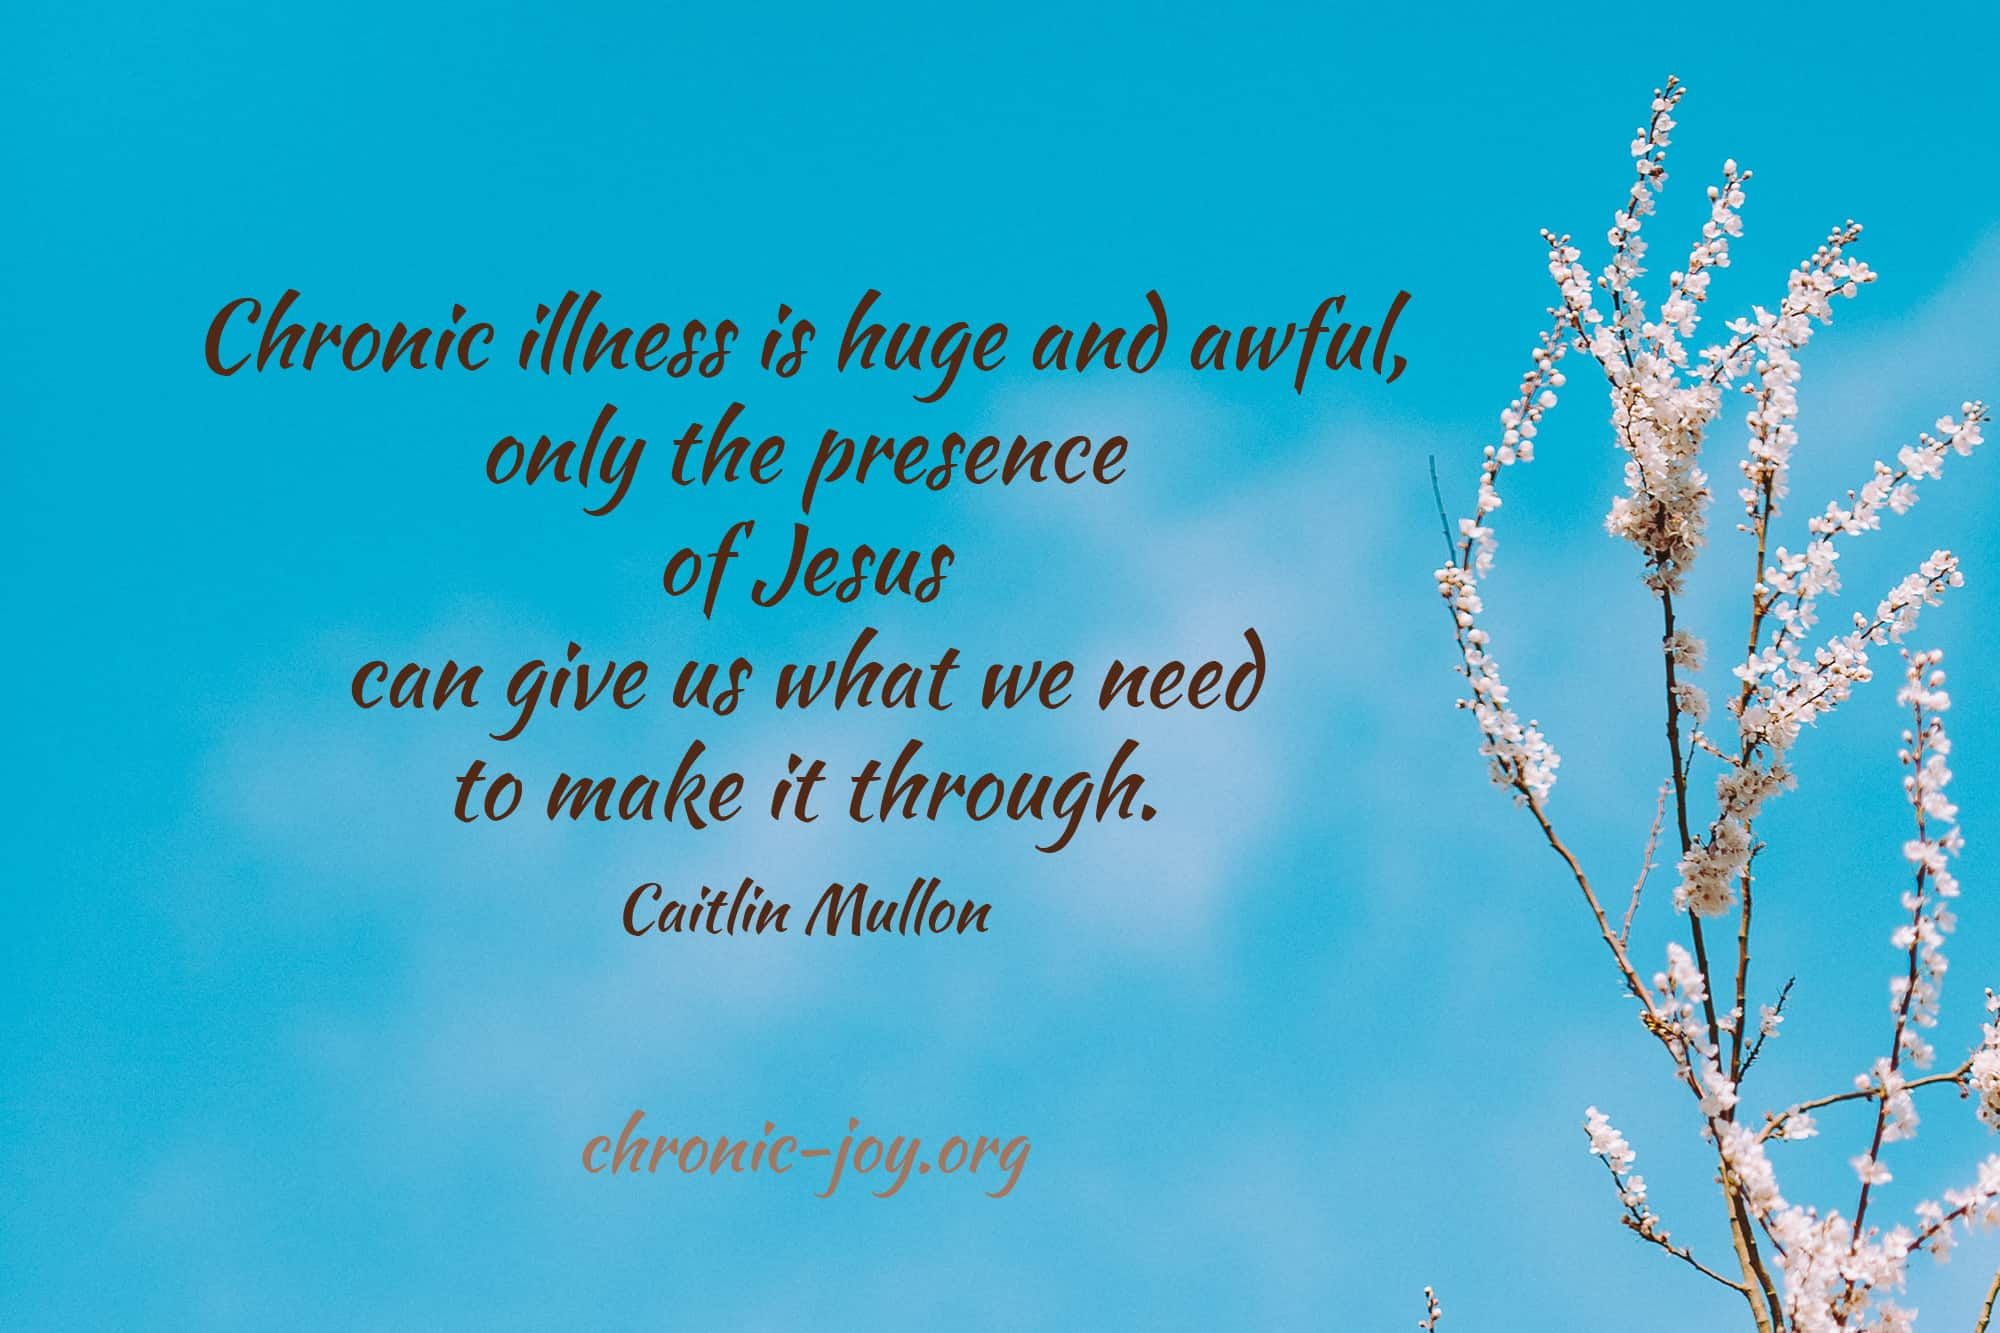 God's Presence in chronic illness